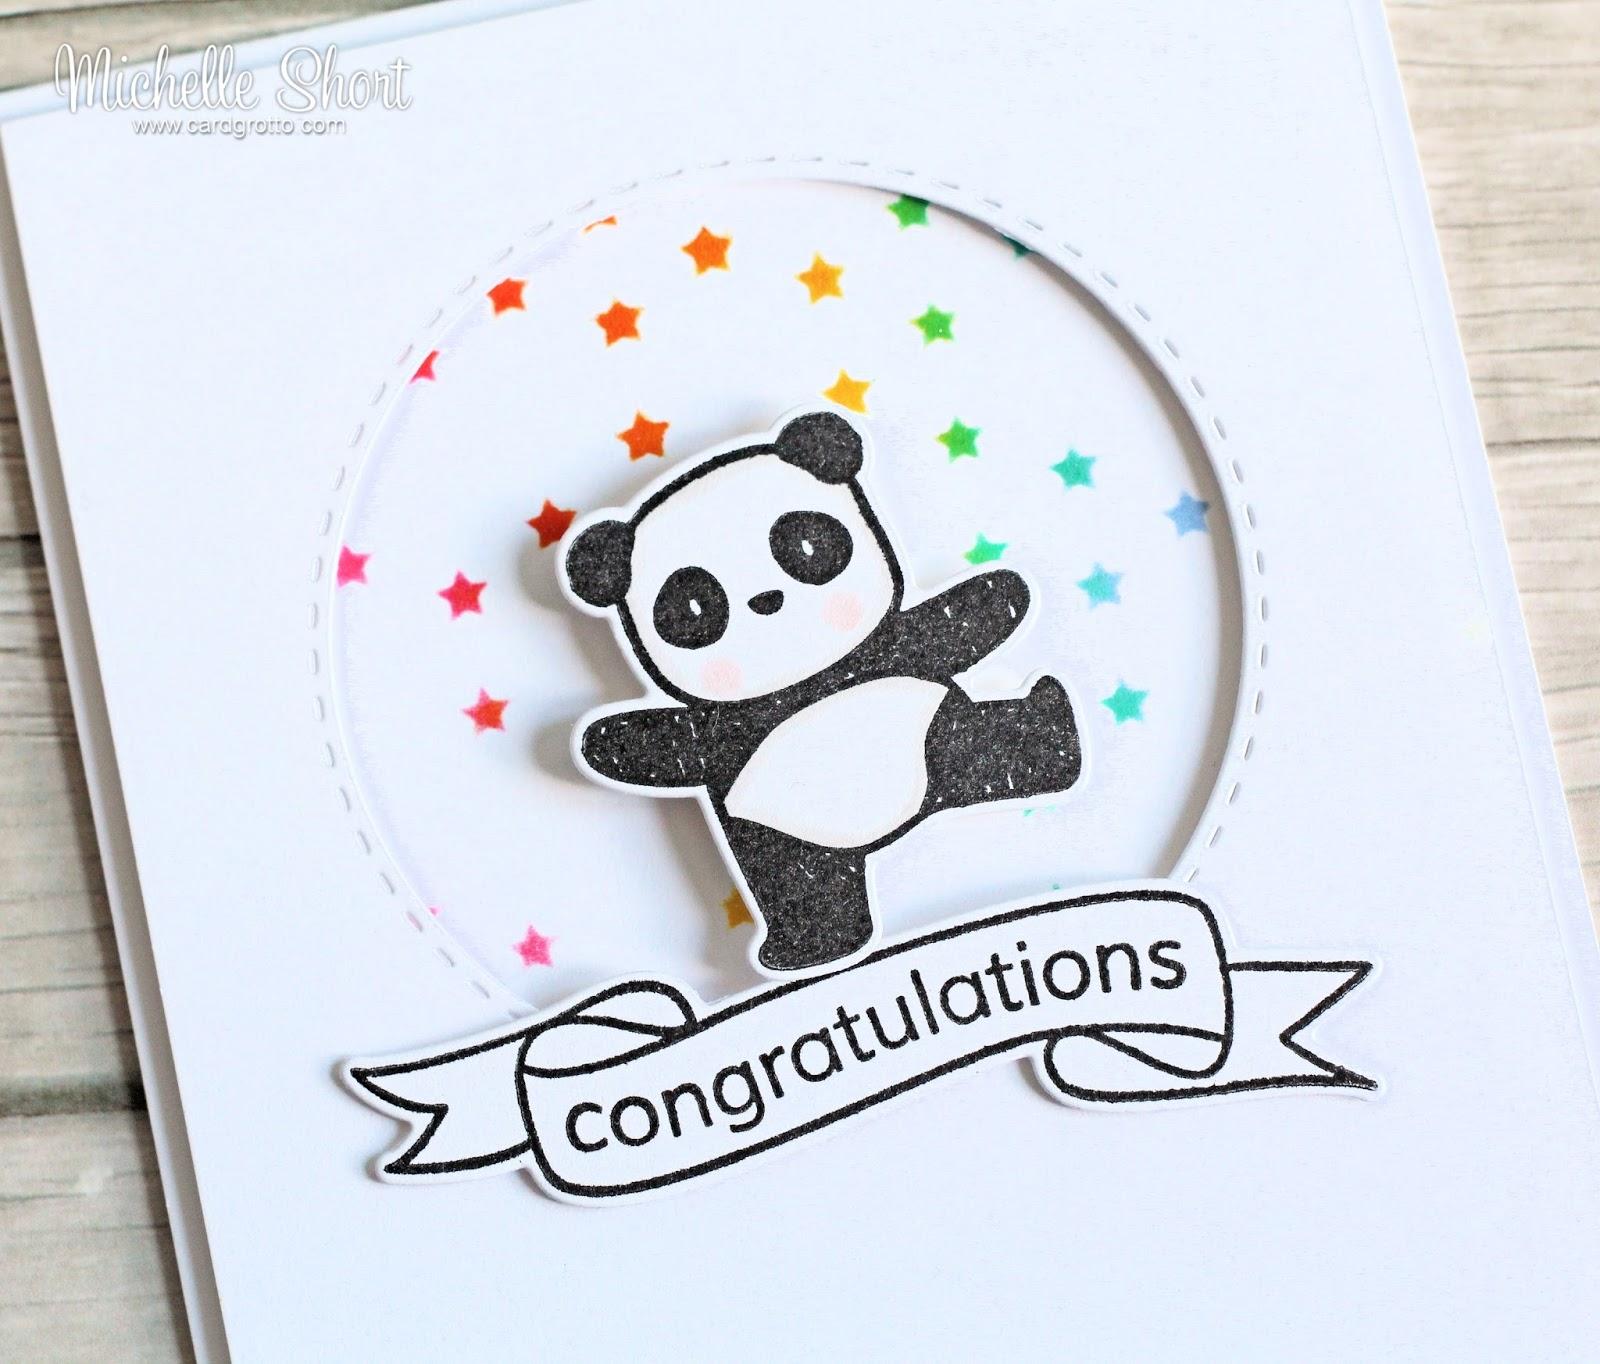 Congratulations Card from Mad Philomena 5eefbd0ceb77150001c1a3b2